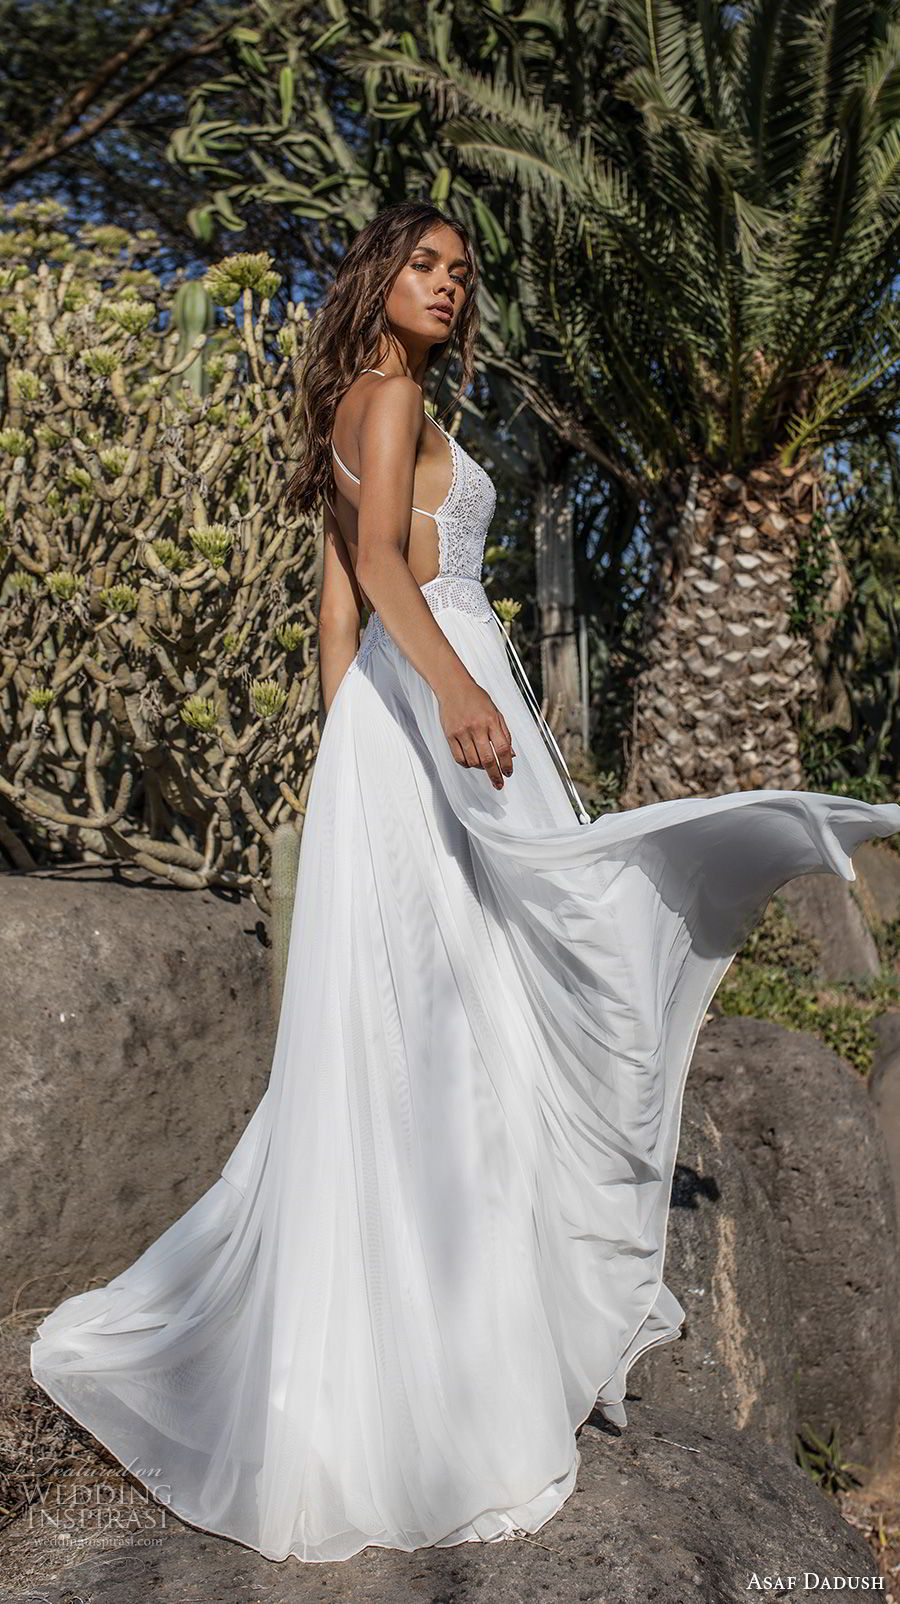 asaf dadush 2018 bridal sleeveless thin strap sweetheart neckline heavily embellished bodice romantic bohemian soft a  line wedding dress open strap back sweep train (1) bv